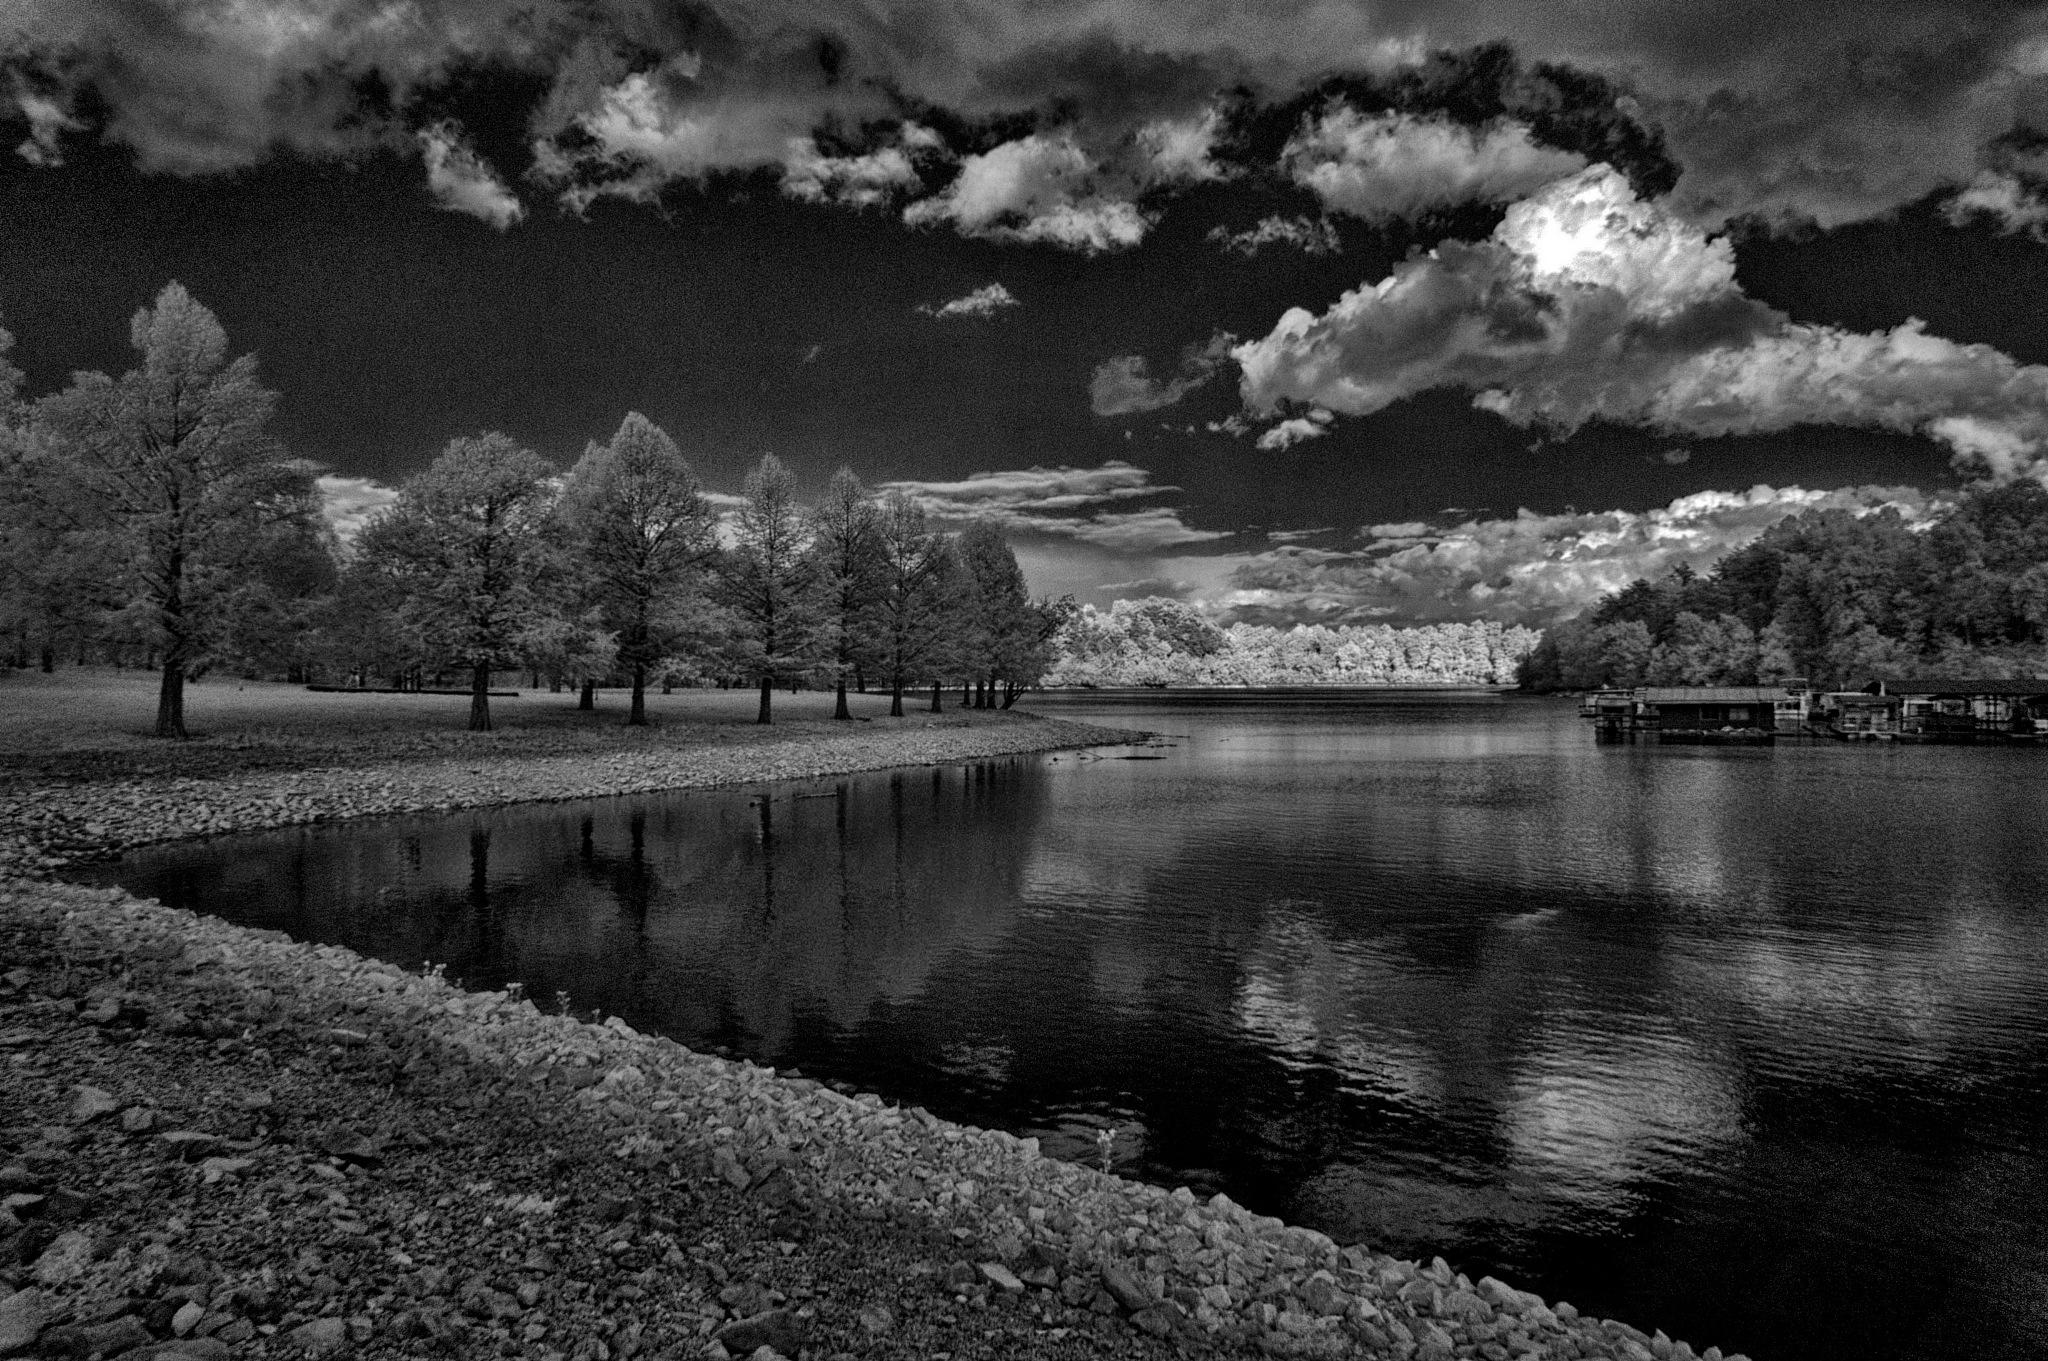 Nolin Lake by Dean Francisco